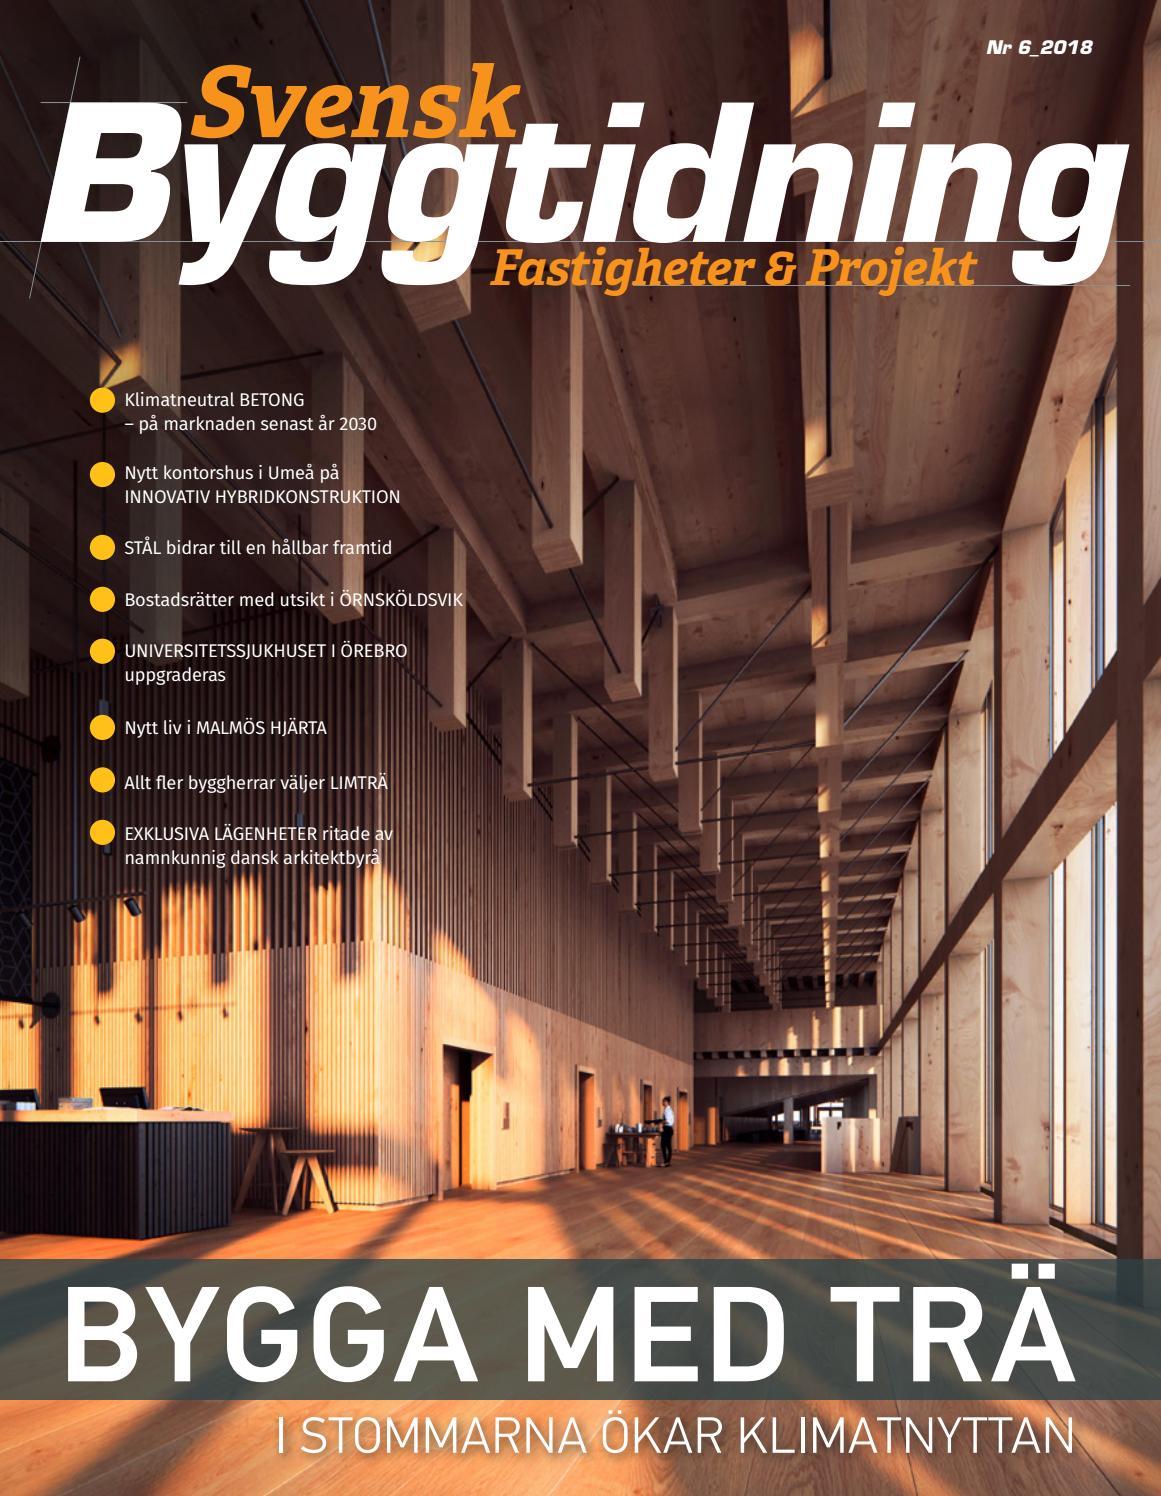 Svensk Byggtidning 6 2018 by Stordåhd Kommunikation AB - issuu d7922395a7e08